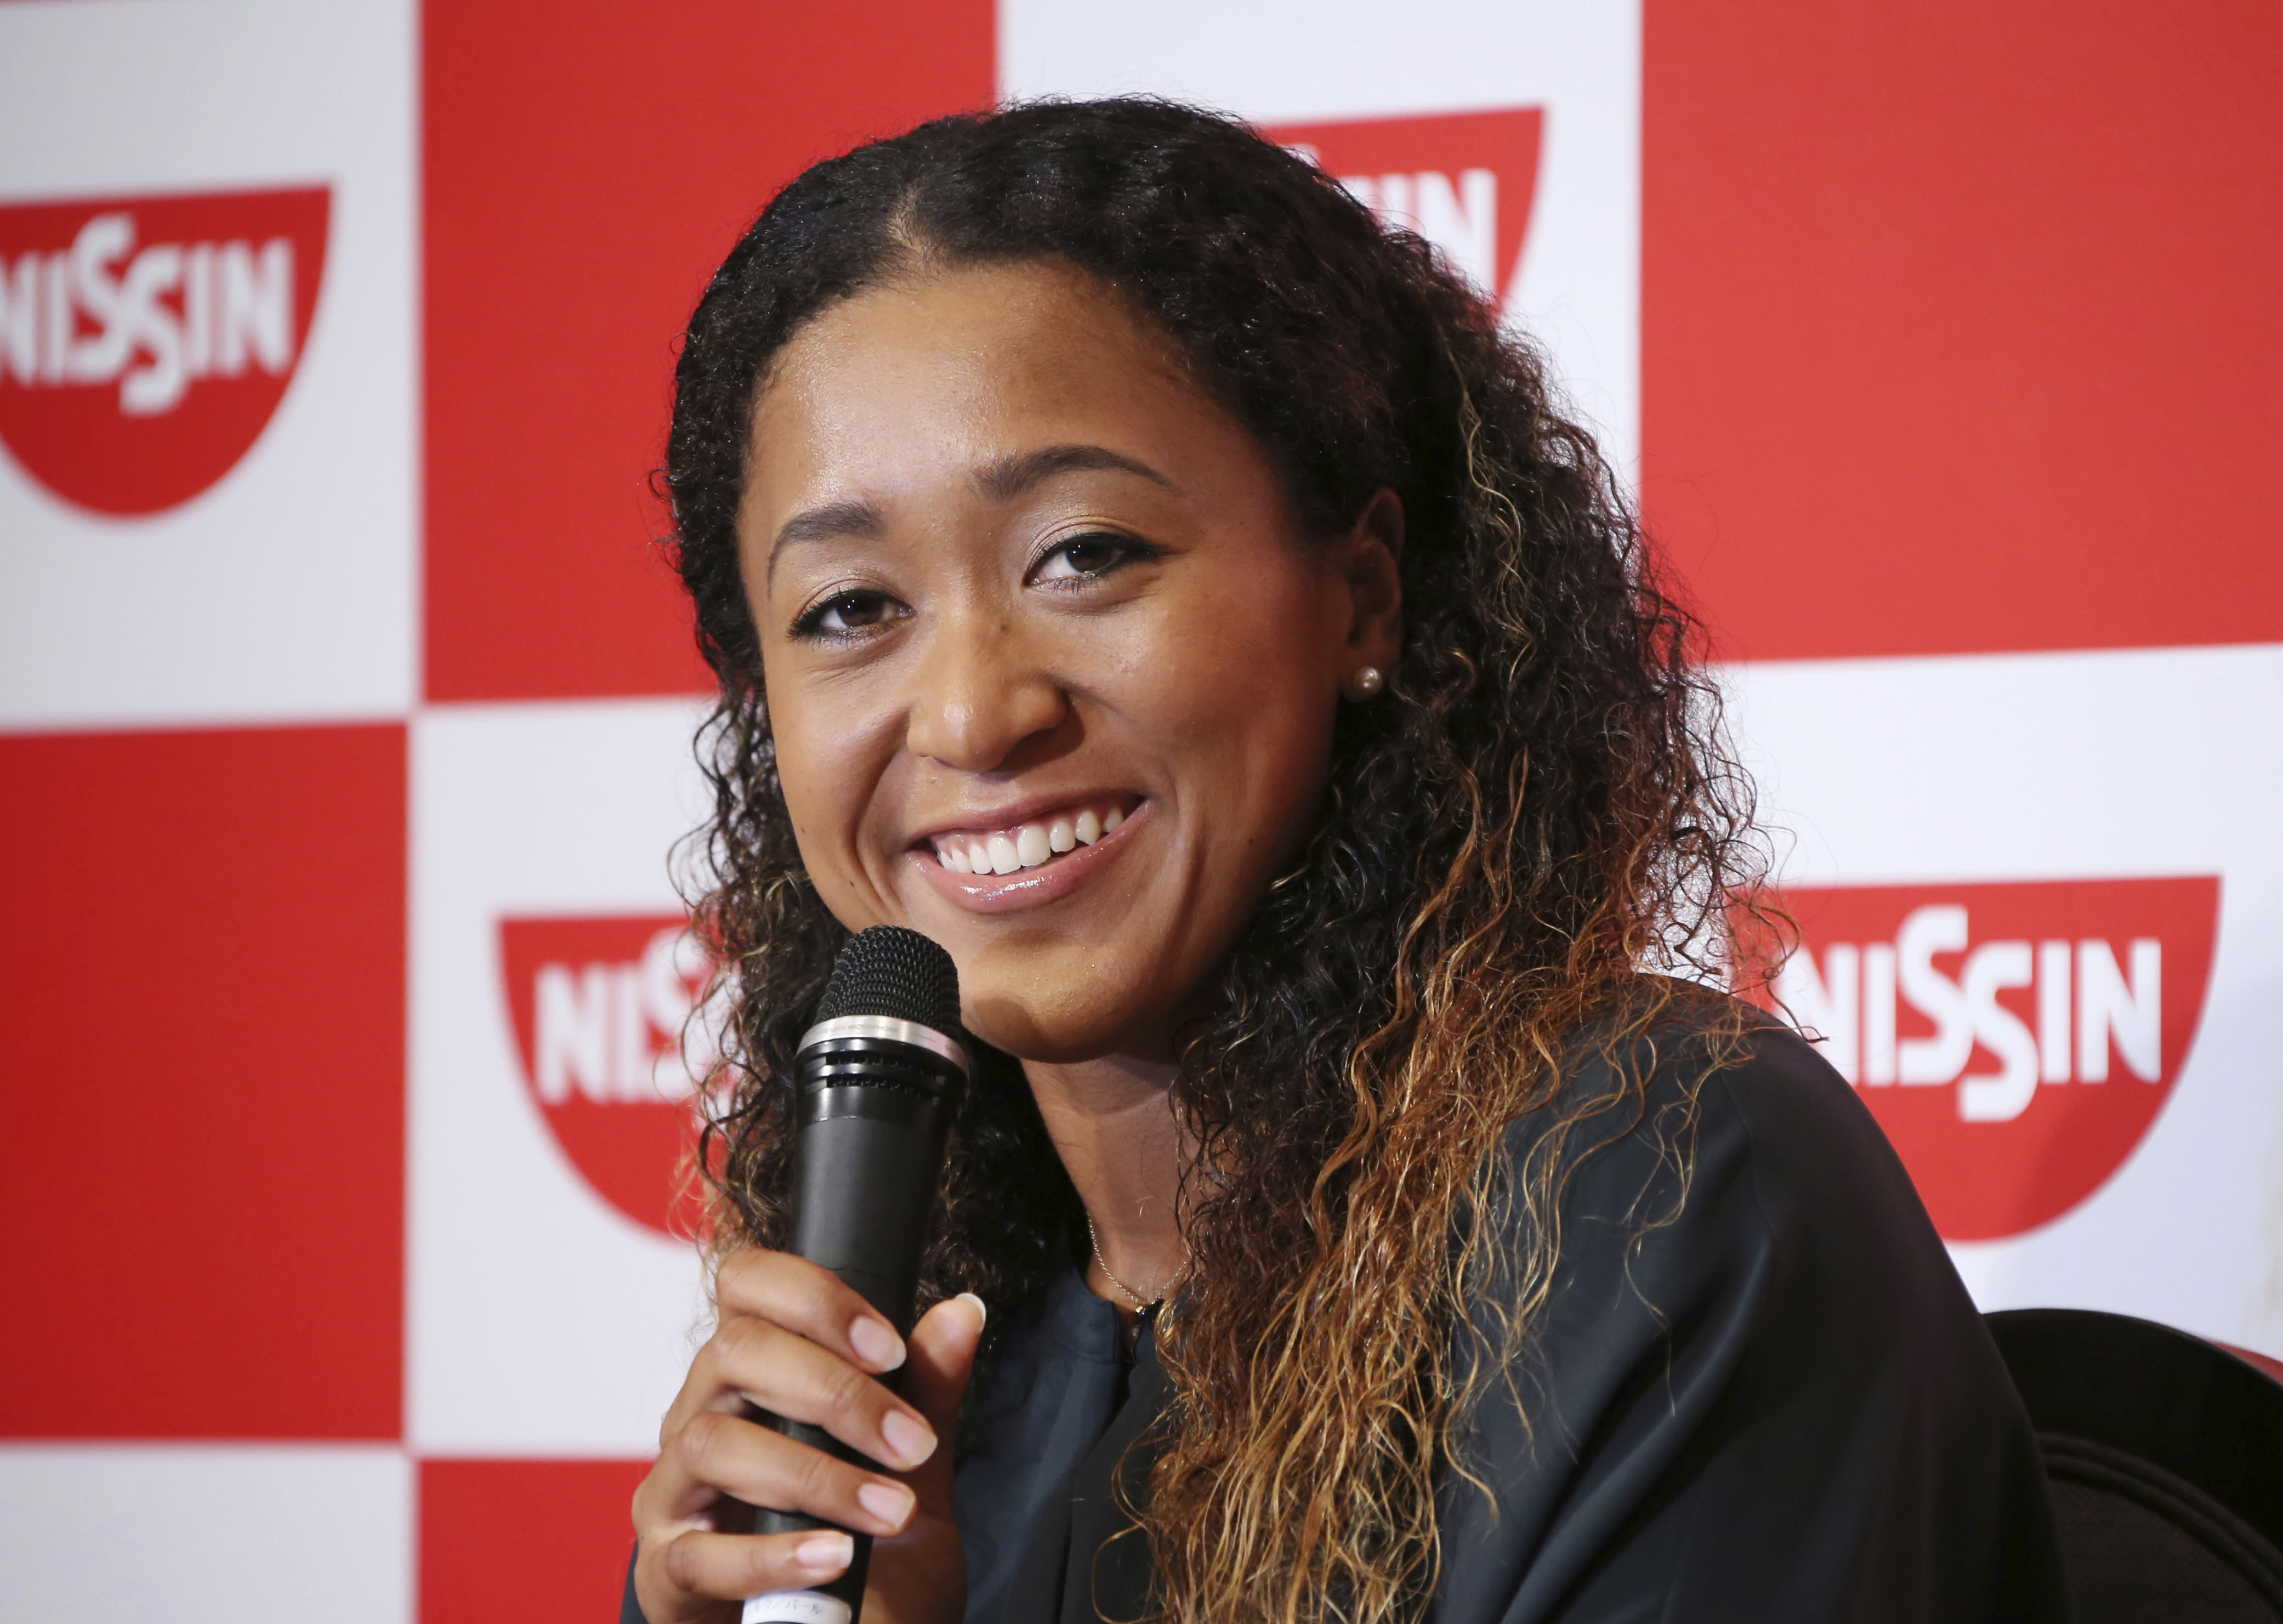 Naomi Osaka: Naomi Osaka Tells Ellen What Serena Williams Whispered To Her